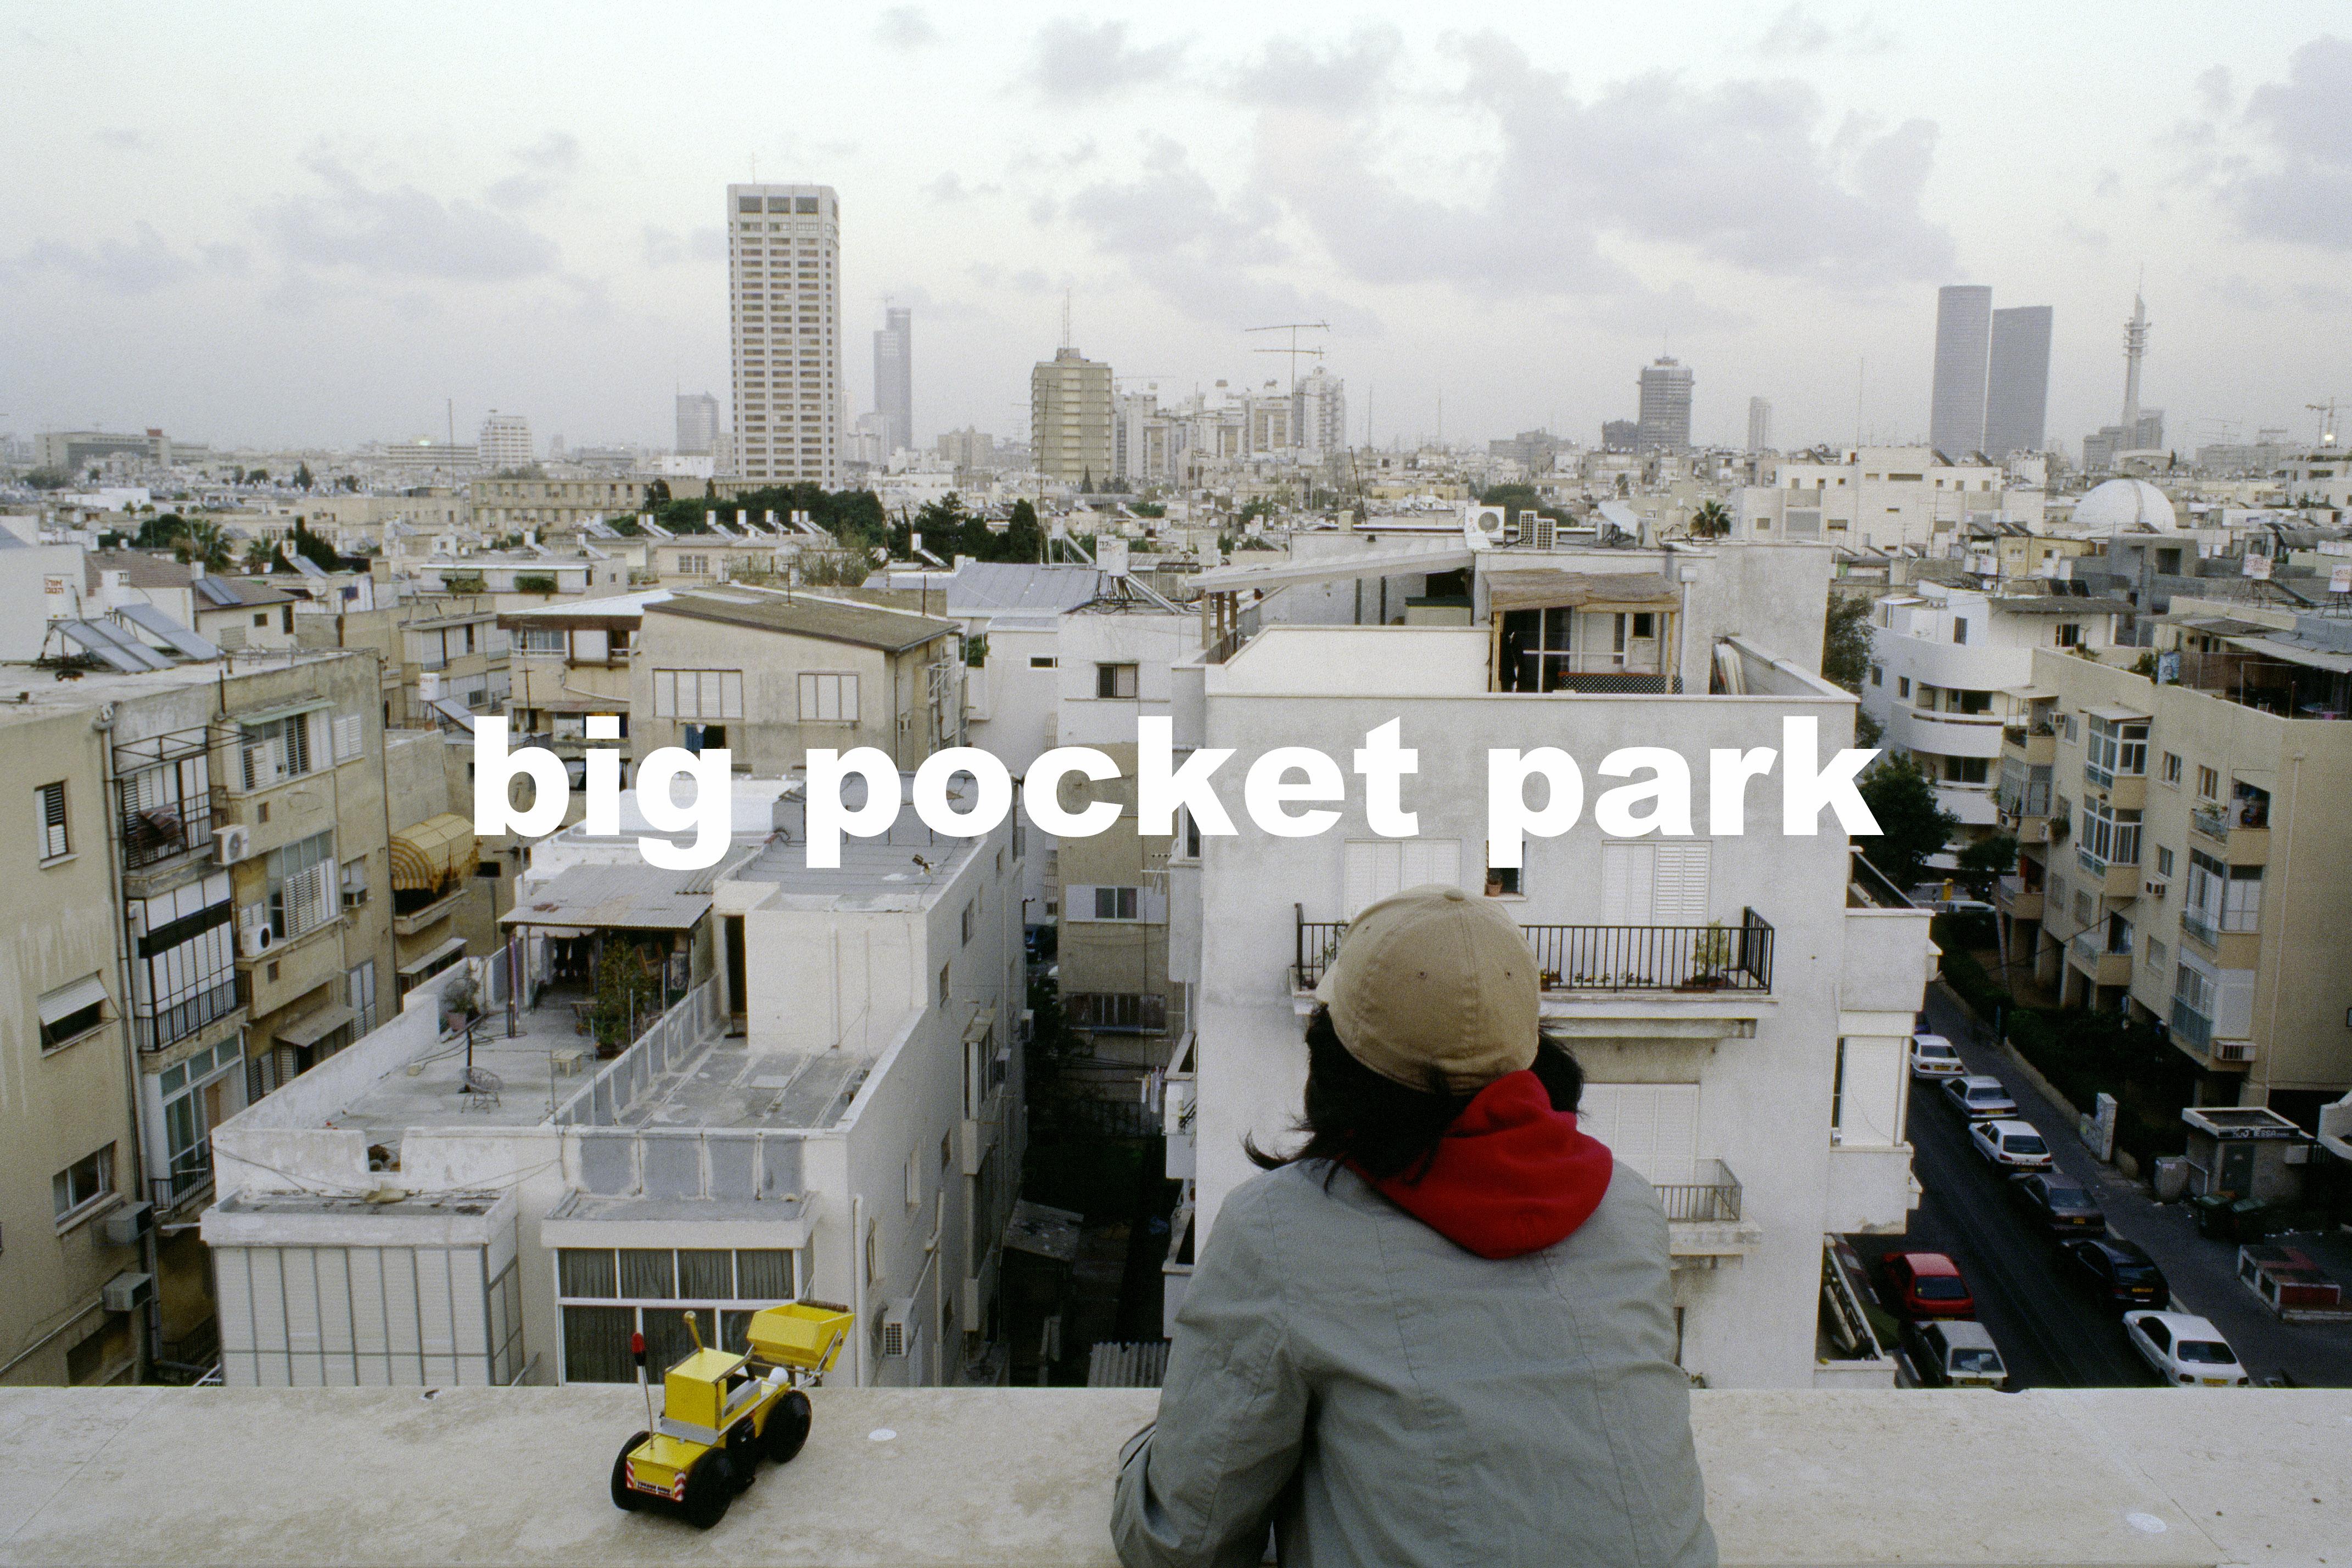 big pocket park